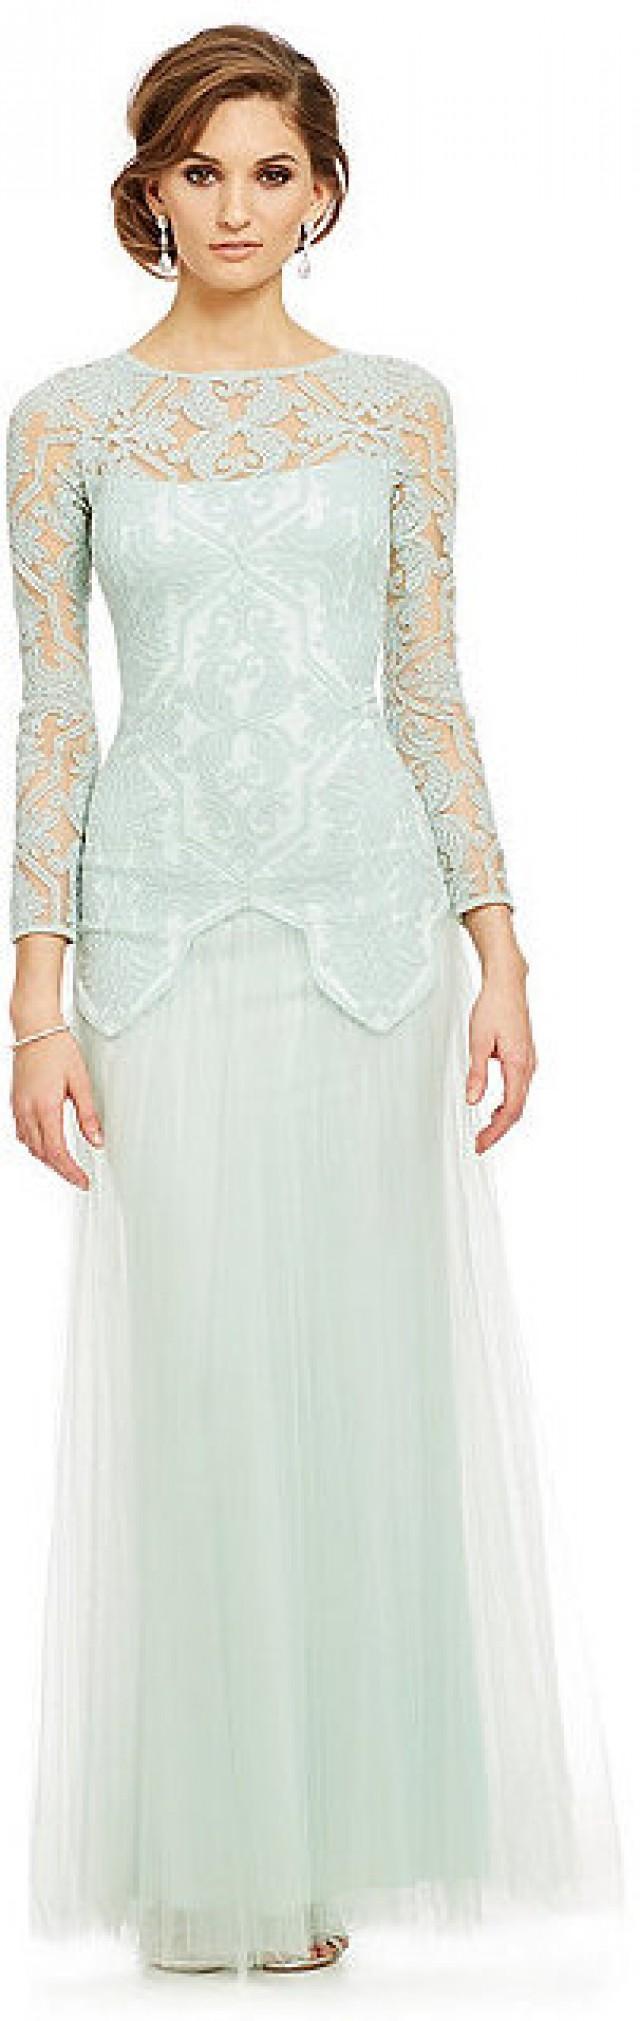 Tadashi Shoji Long Sleeve Embroidered Tulle Gown #2326204 - Weddbook